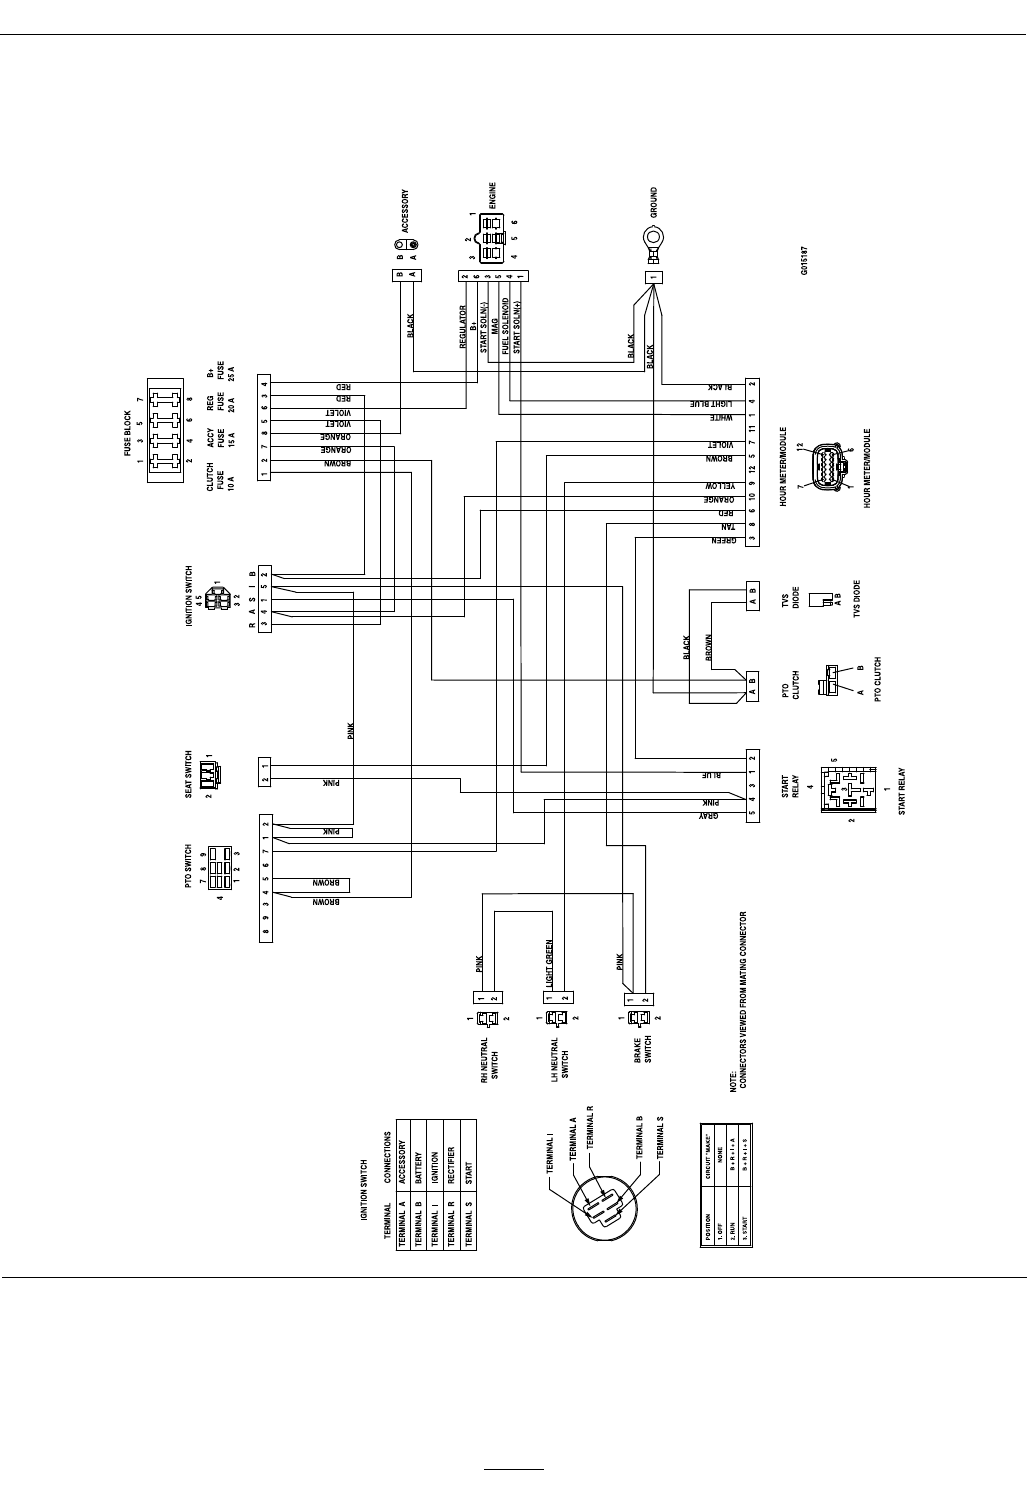 Exmark Pioneer S Series 0 Users ManualUserManual.wiki